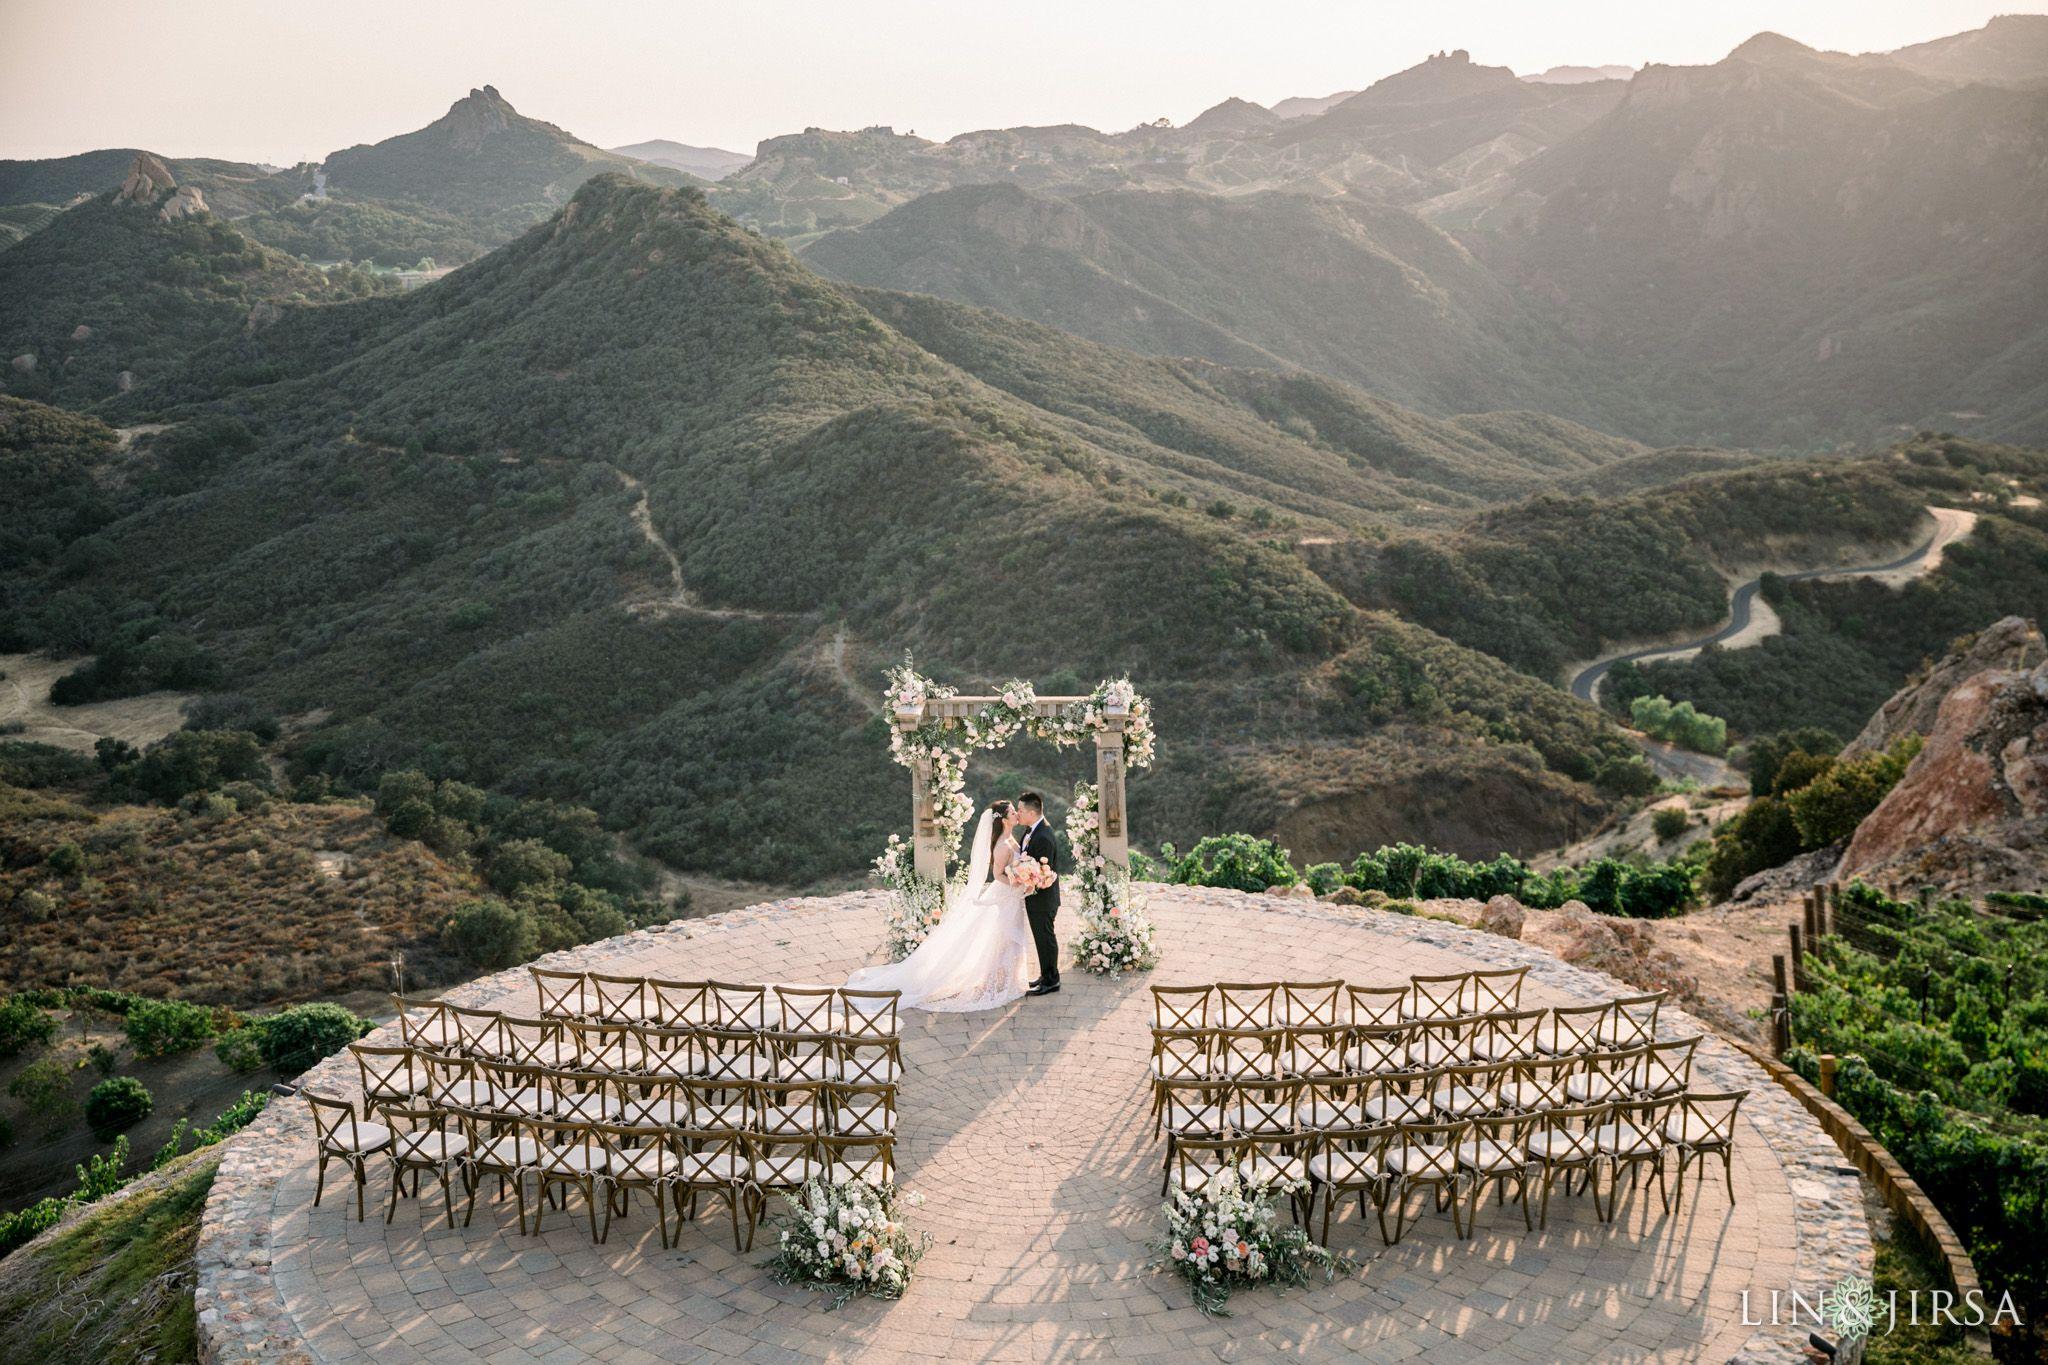 Malibu Rocky Oaks Wedding.032 Malibu Rocky Oaks Filmic Wedding Photography Malibu Rocky Oaks